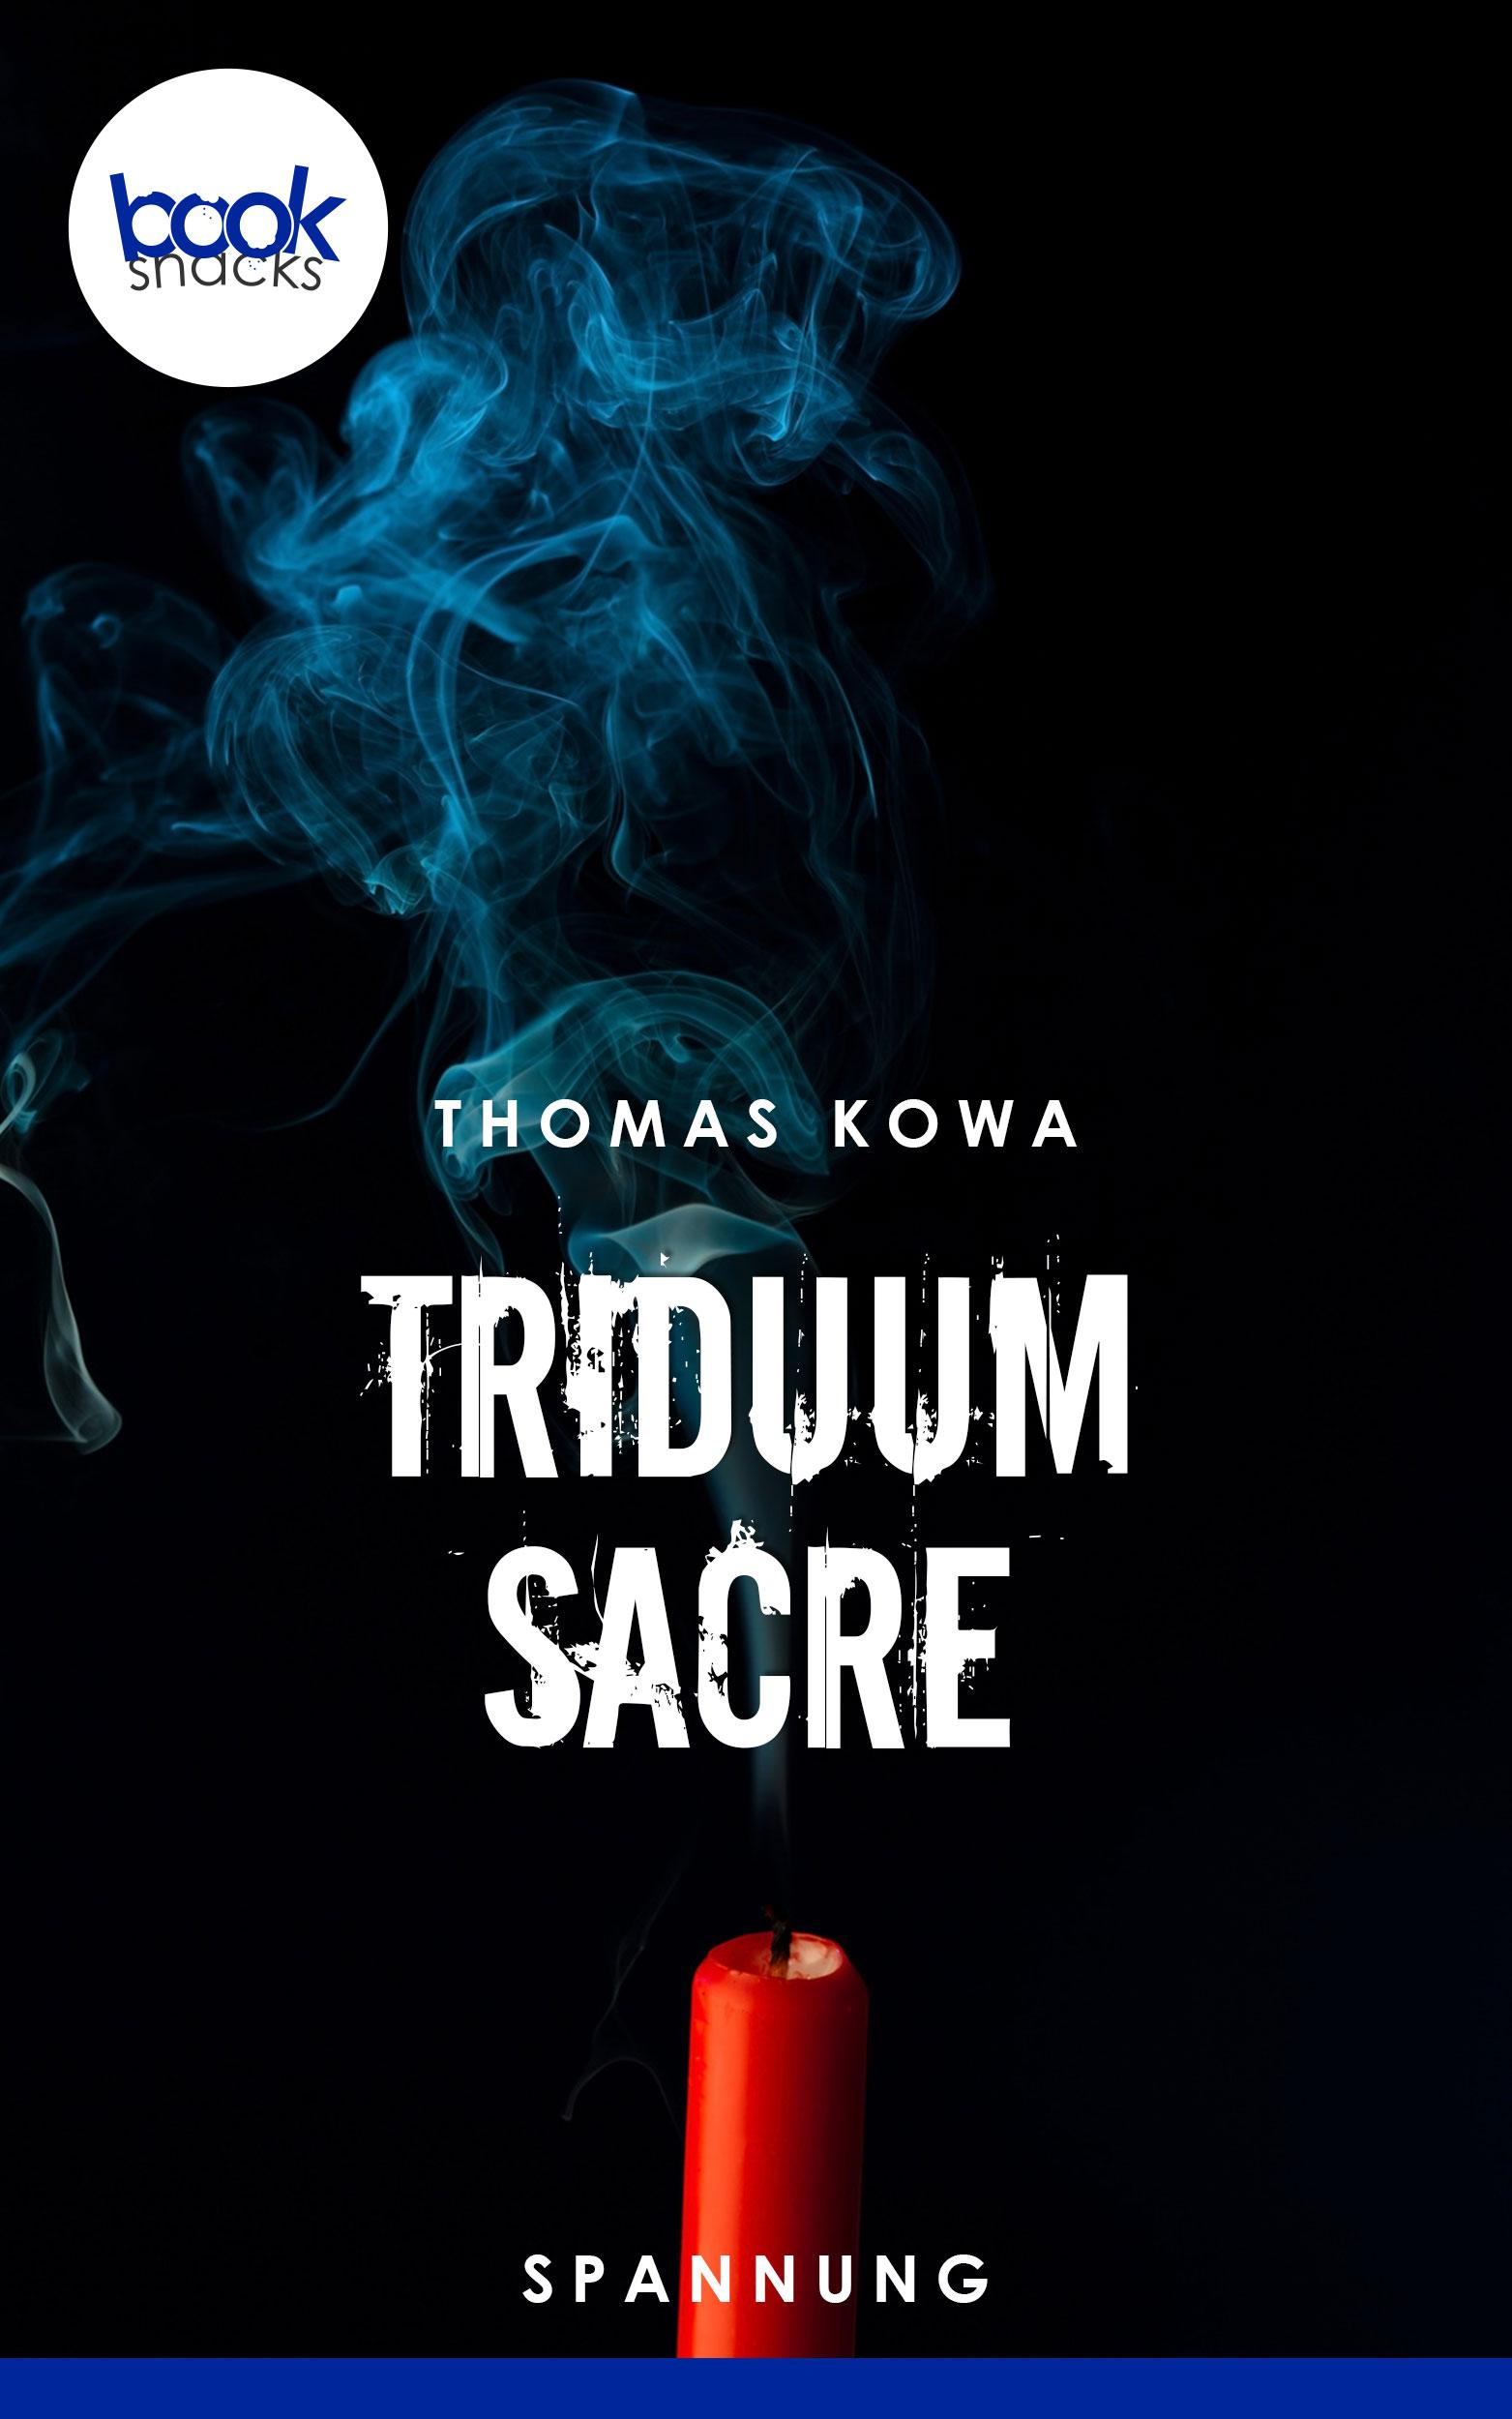 Kowa_Triduum-Sacre